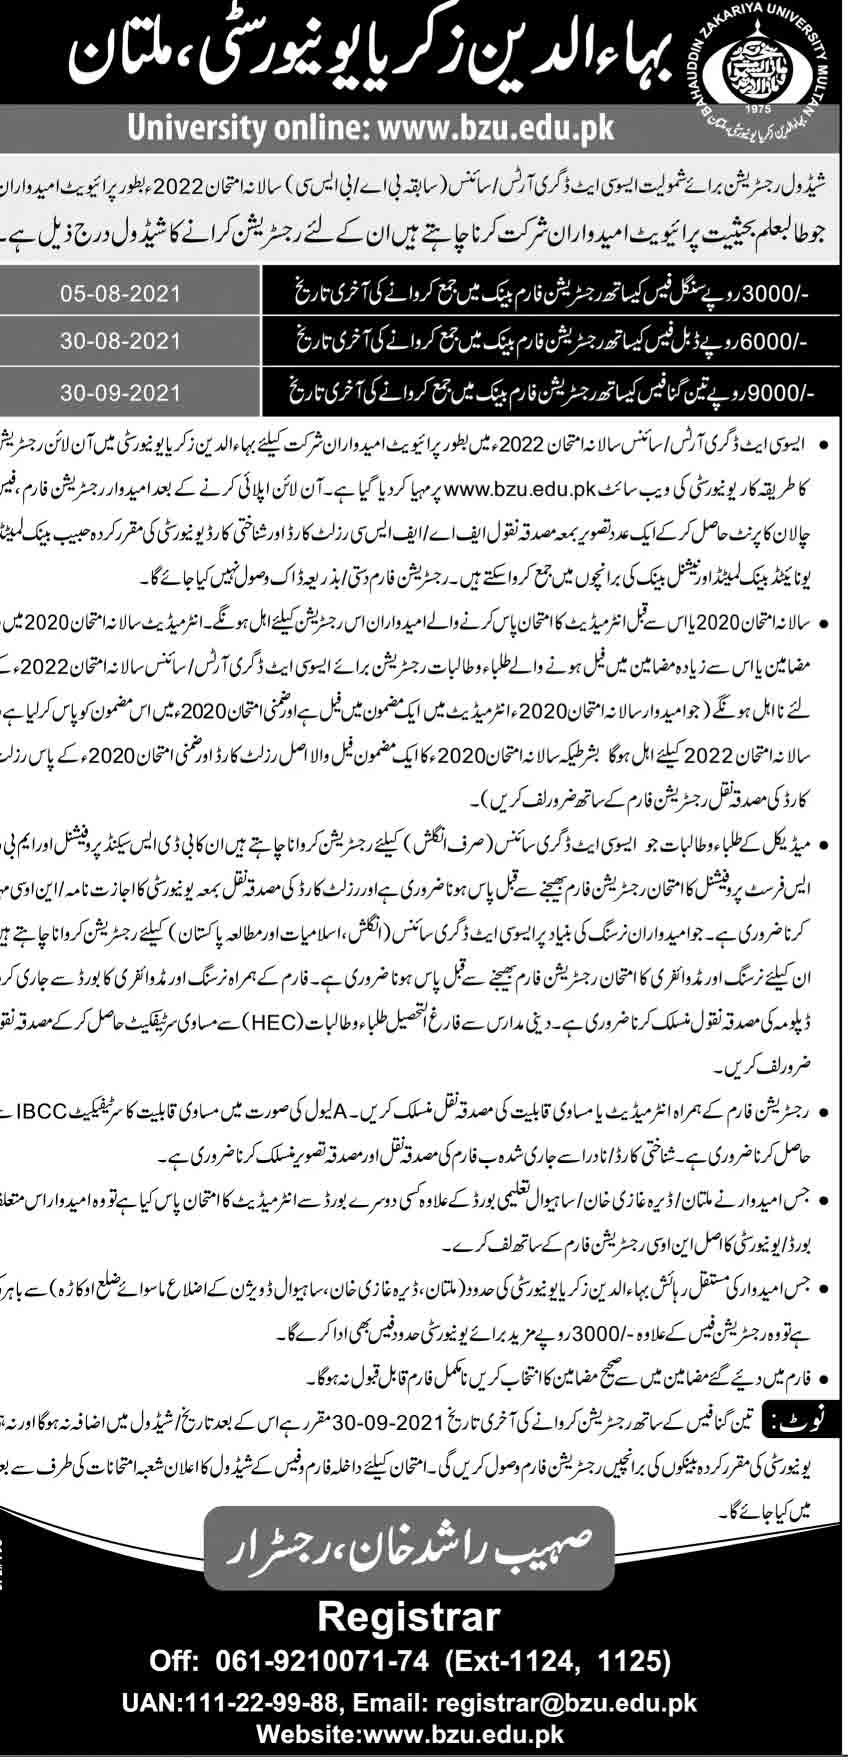 BZU-Multan-BA-BSc-Registration-Schedule-2021